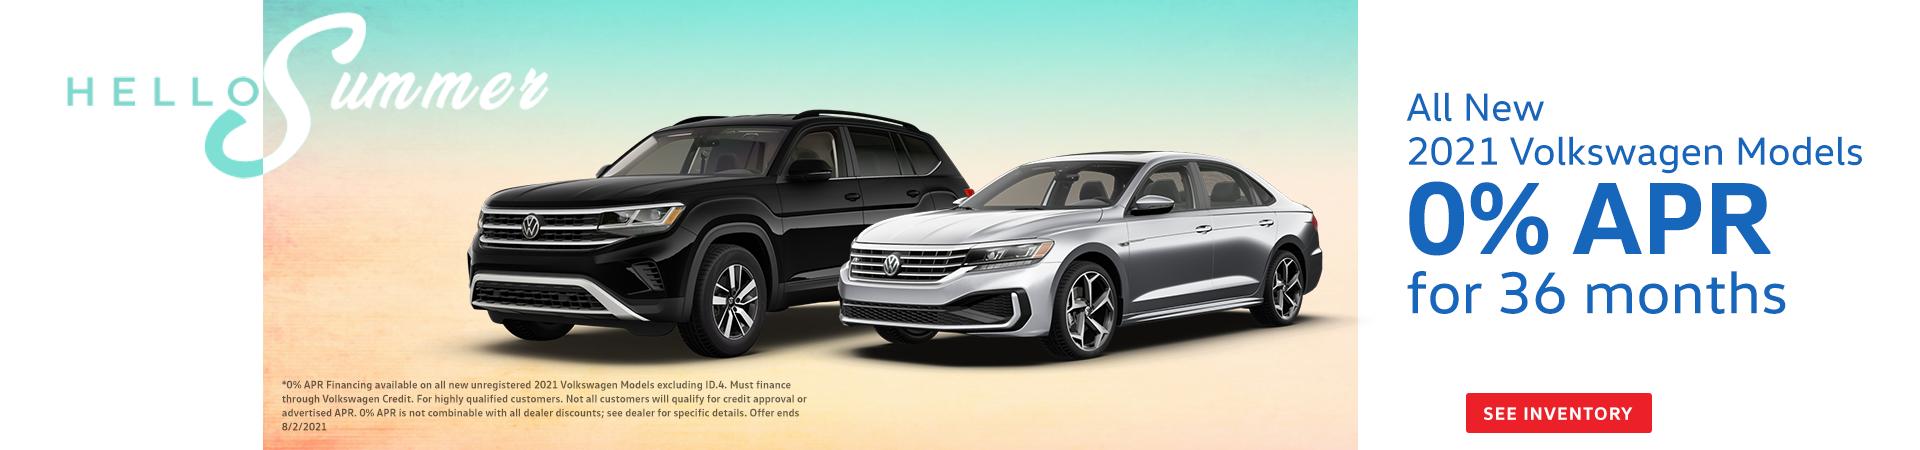 0% APR on all 2021 Volkswagen Models*